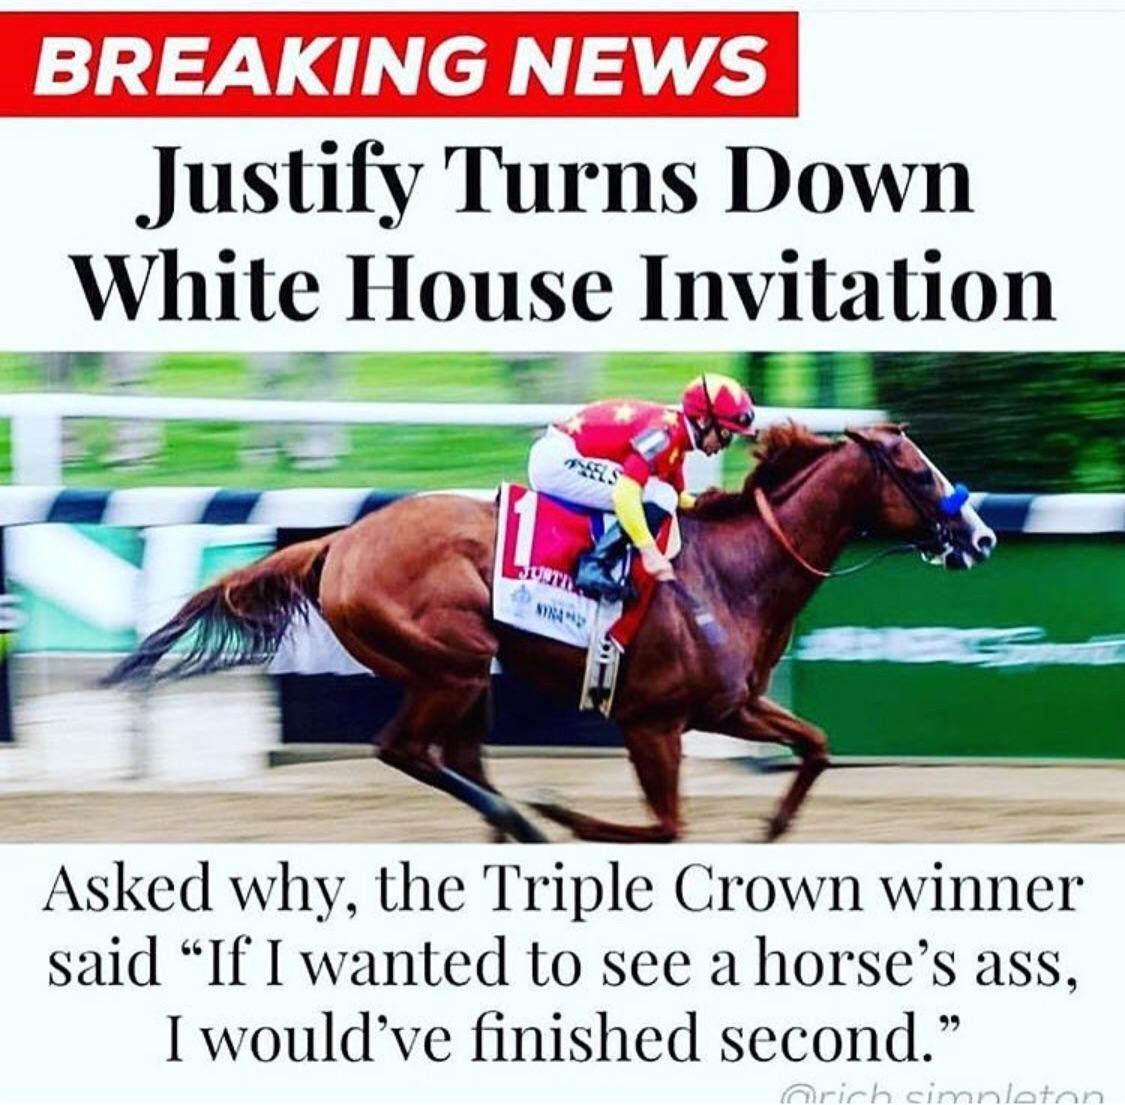 Another champion denies visit